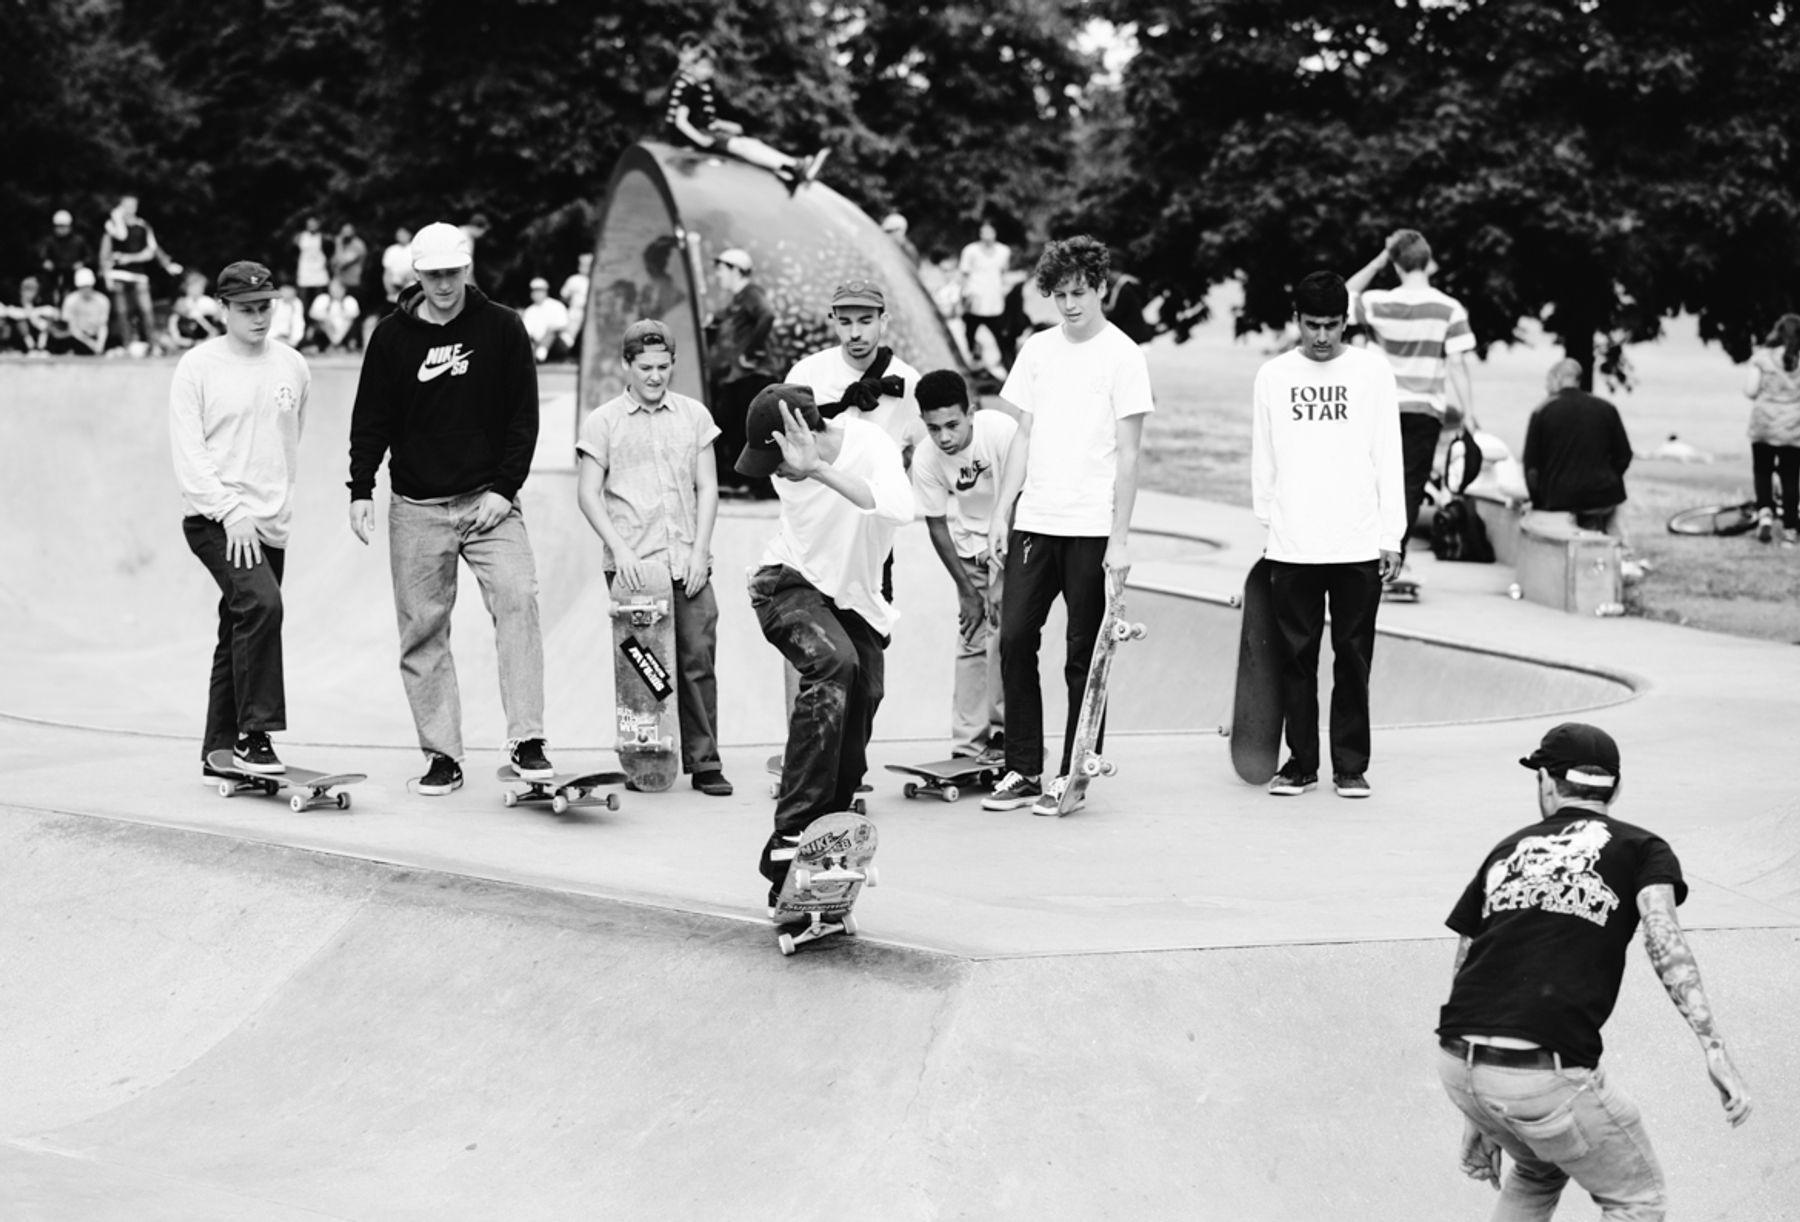 _IHC8057e-Kyron-Davis-Bs-180-Switch-Crooked-Matthew-Hay-Casper-Brooker-Arthur-Derrien-Nike-SB-x-Slam-City-Skates-Go-Skateboarding-Day-London-June-2015-Photographer-Maksim-Kalanep